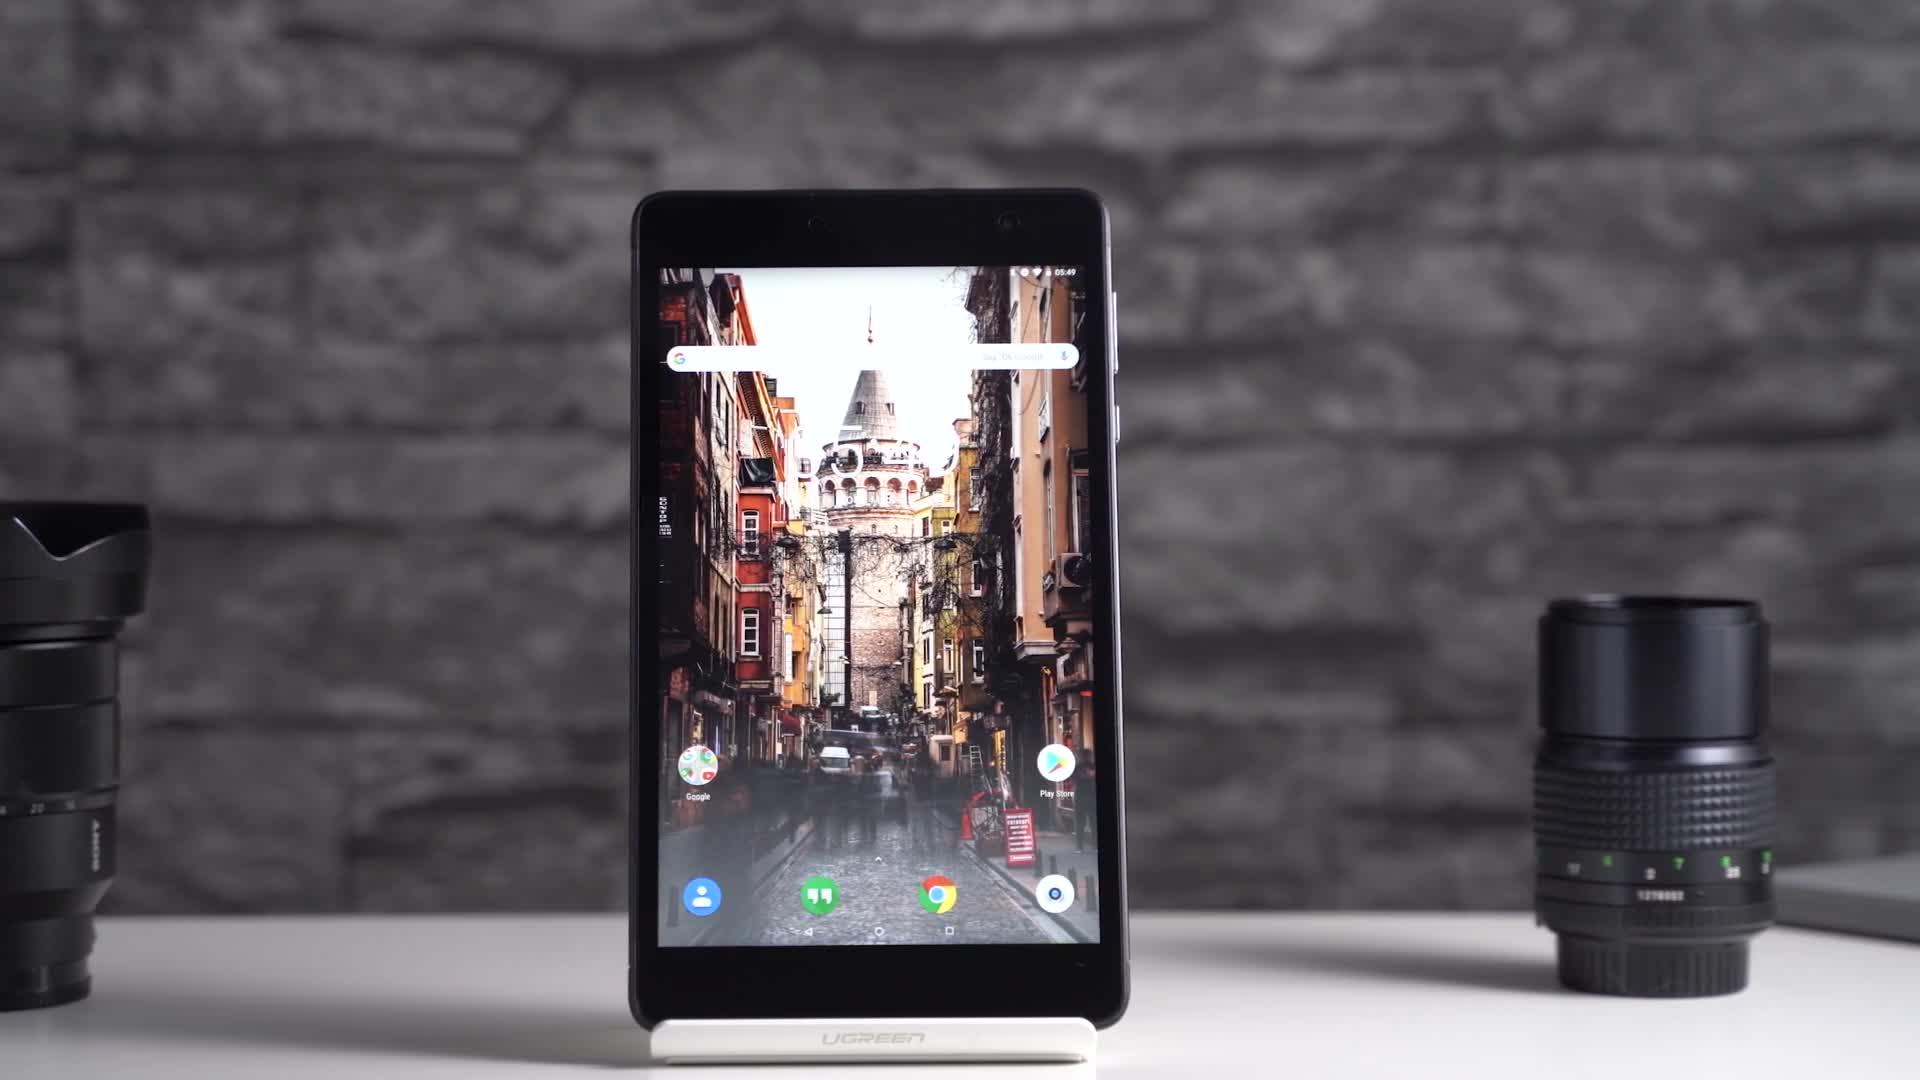 Tablet, Test, Andrzej Tokarski, Tabletblog, Android 8.1, Chuwi, Android 8.1 Oreo, Chuwi Hi8 Se, Hi8 Se